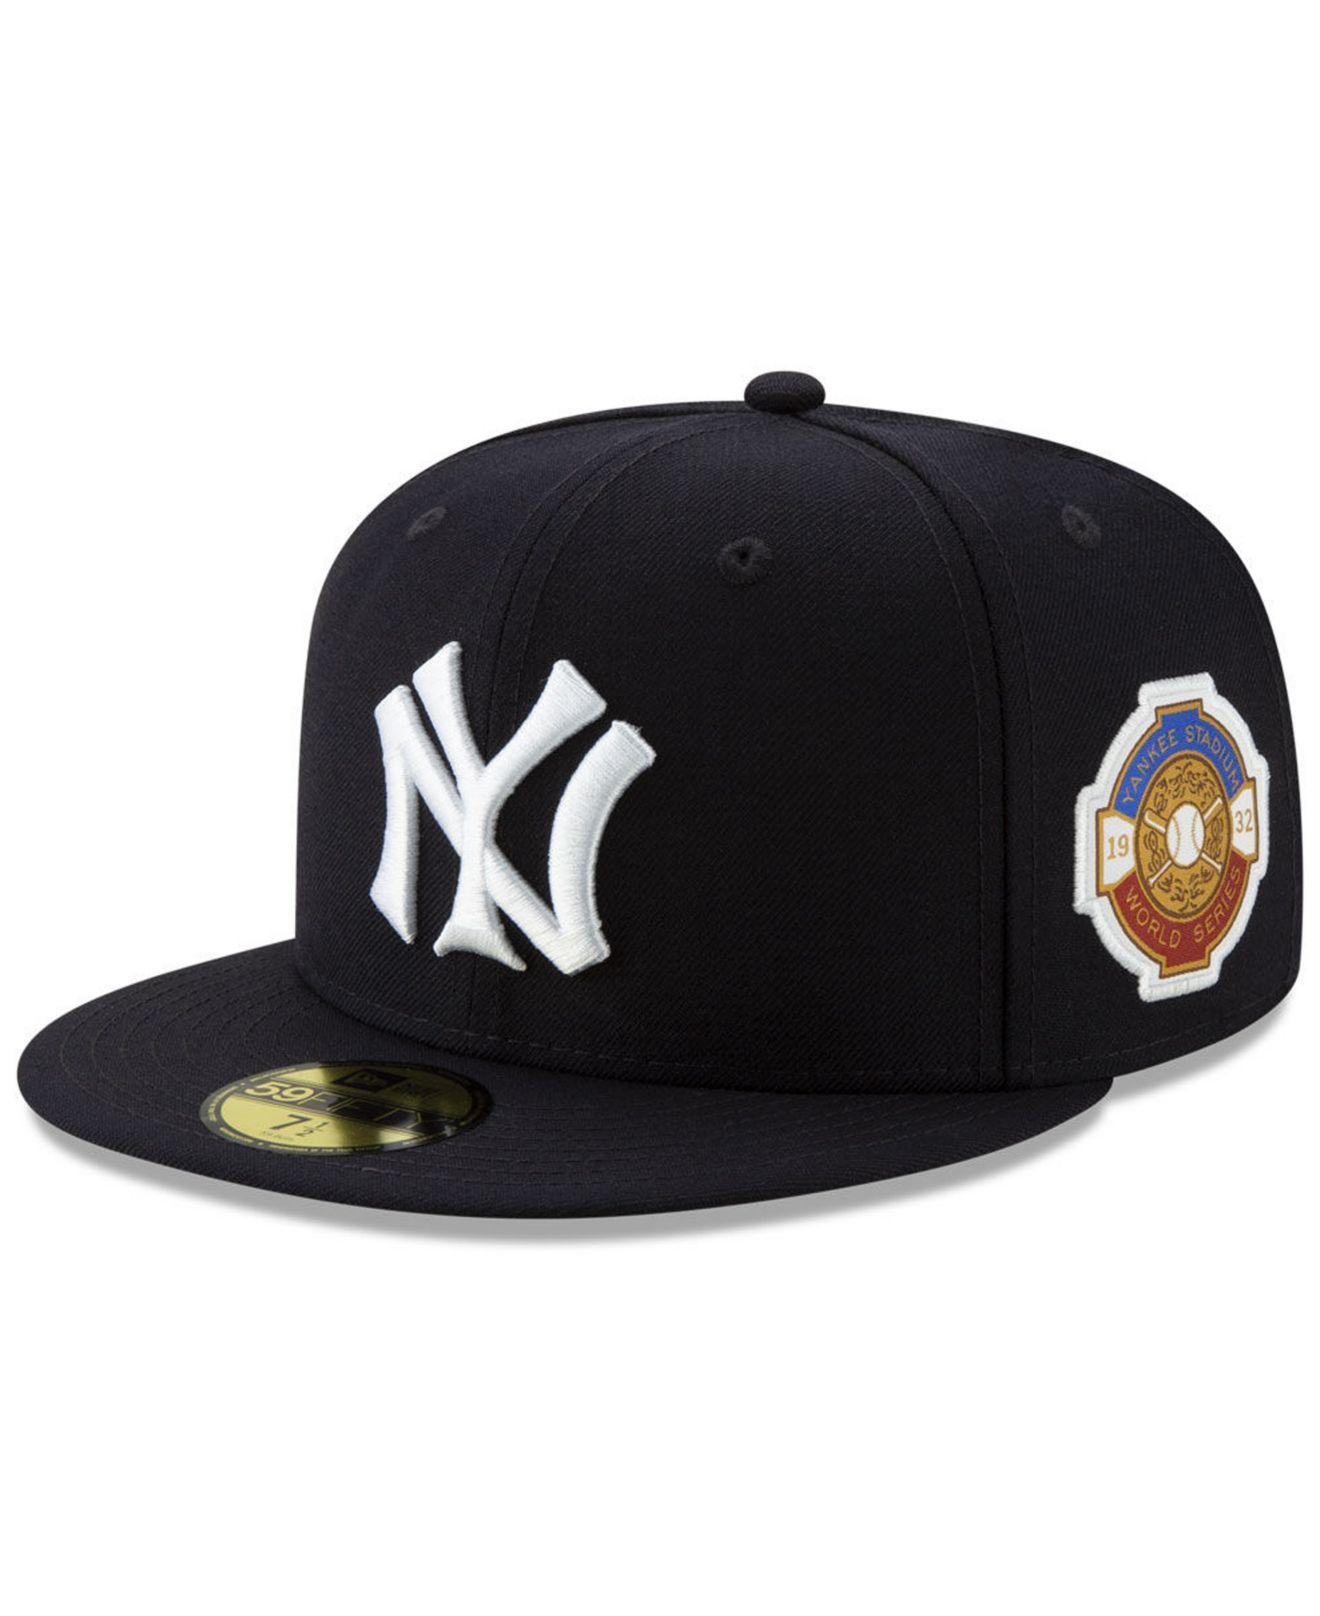 quality design dda53 6b06b KTZ. Men s Black New York Yankees World Series Patch 59fifty Cap